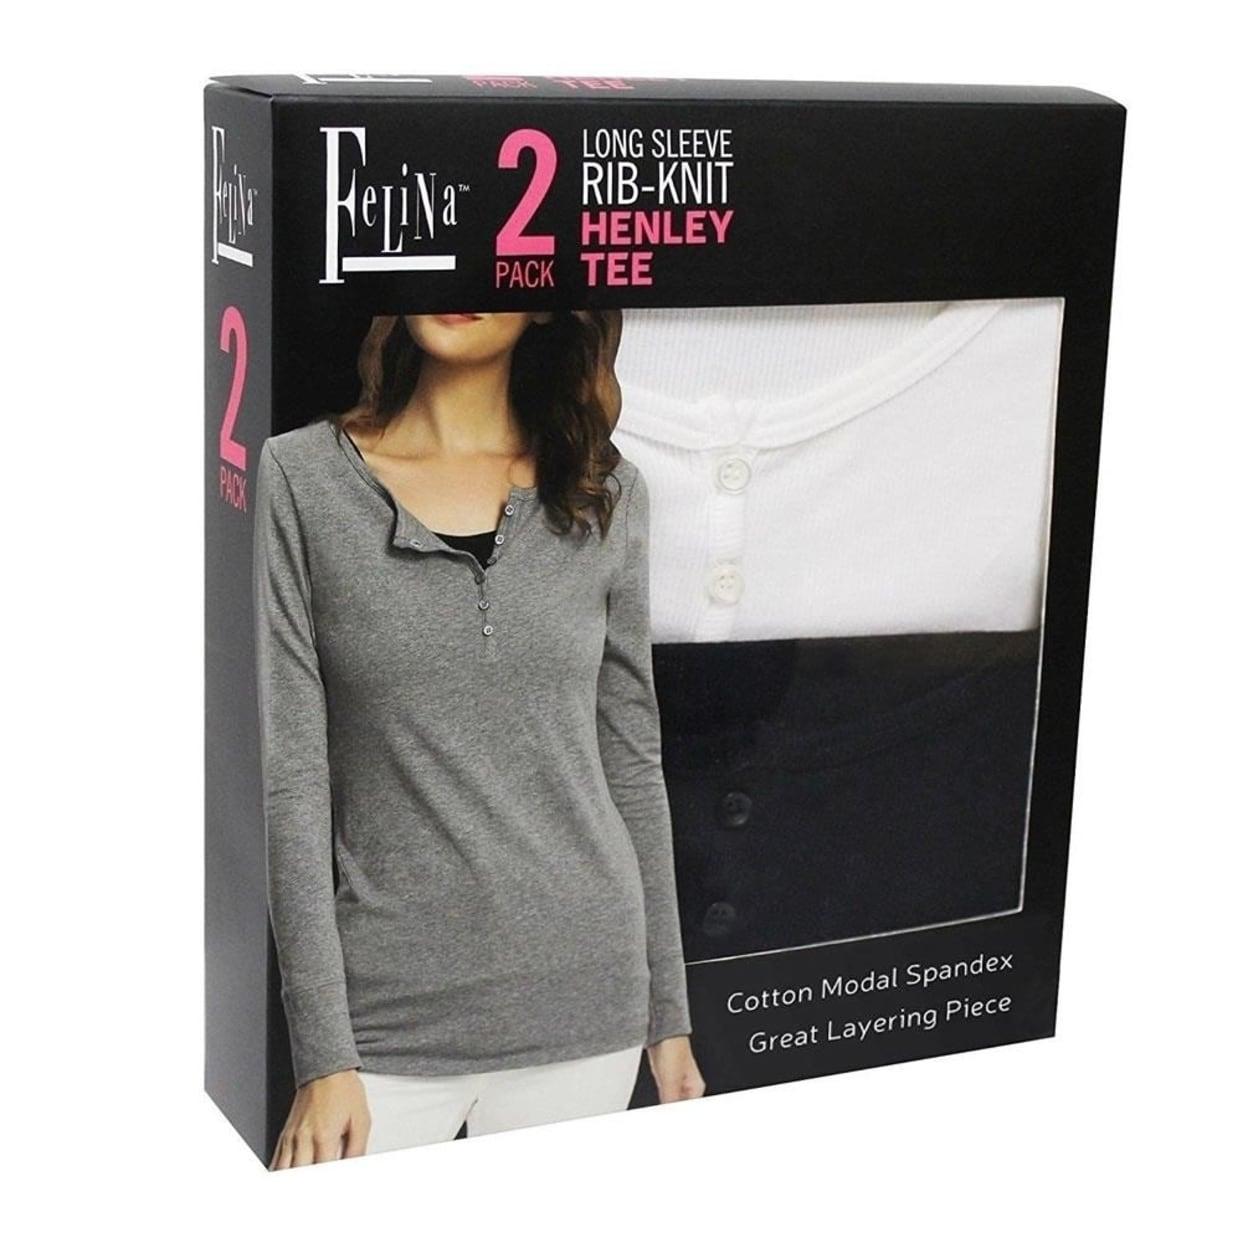 432e72c3716155 Shop Felina Rib-Knit Long Sleeve Henley Tee 2PK Black White size XL 14-16  Womens Shirt Top Designer Fashion - On Sale - Free Shipping On Orders Over   45 ...